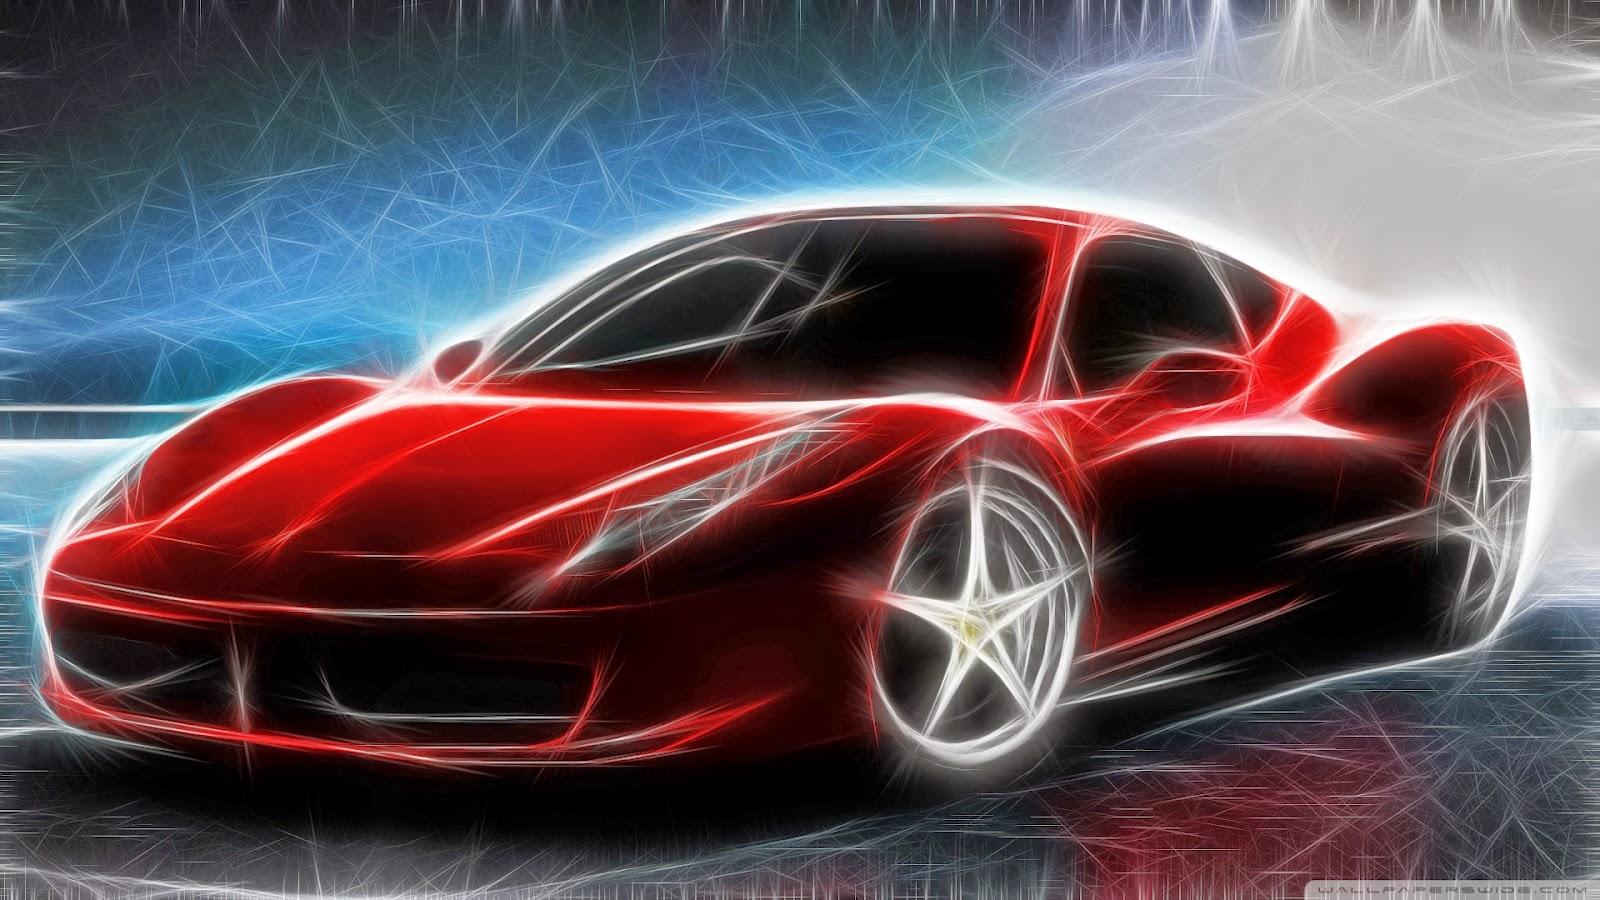 Wallpaper Hp Keren: IPHONE: Wallpaper Ferrari HD